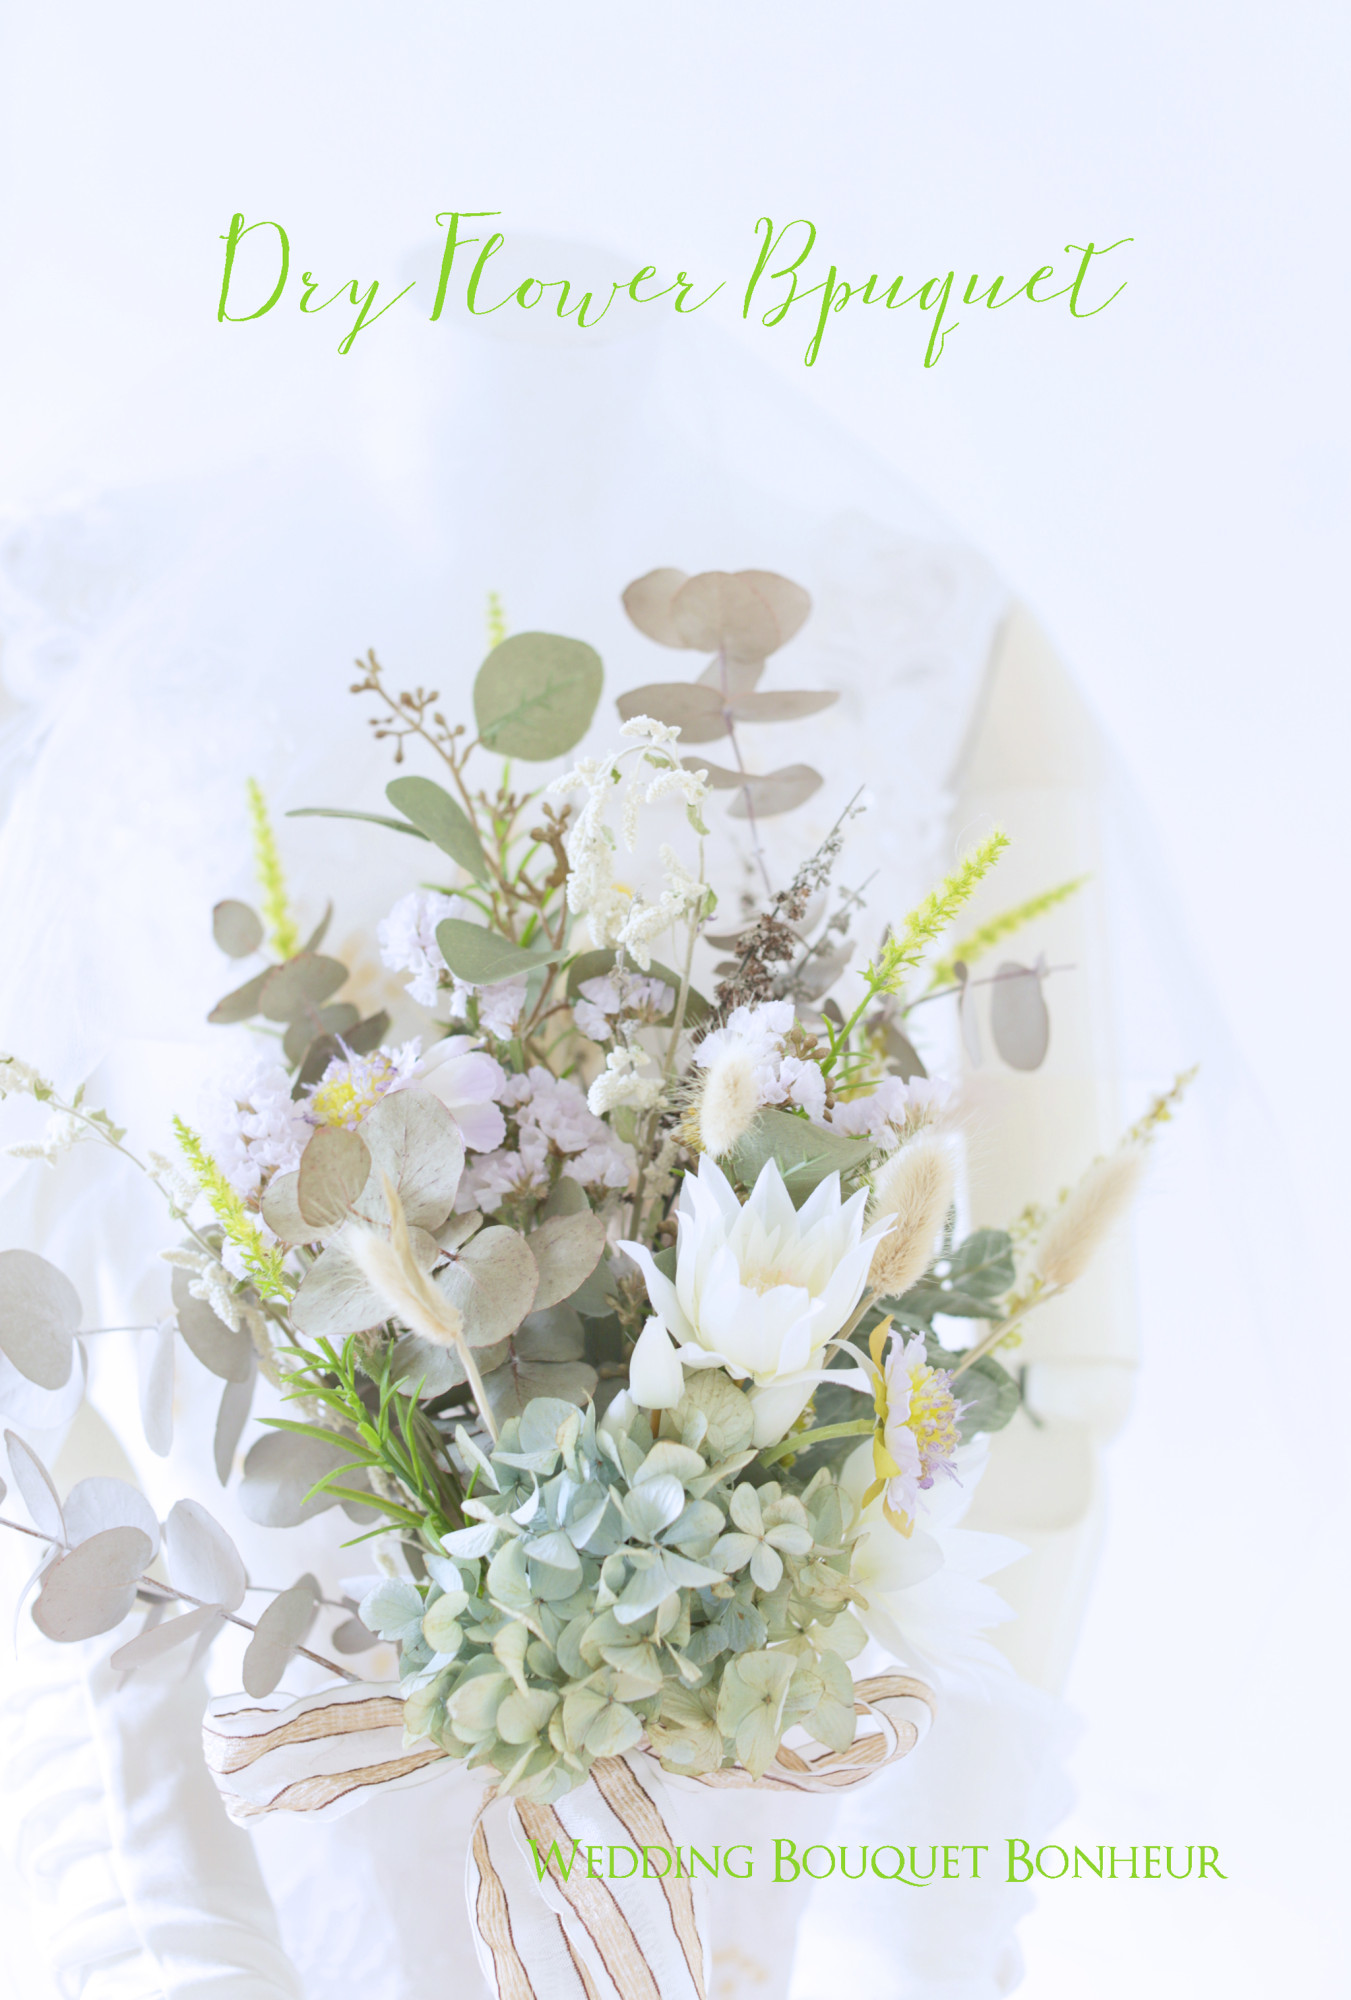 b_bouquet20180524_2